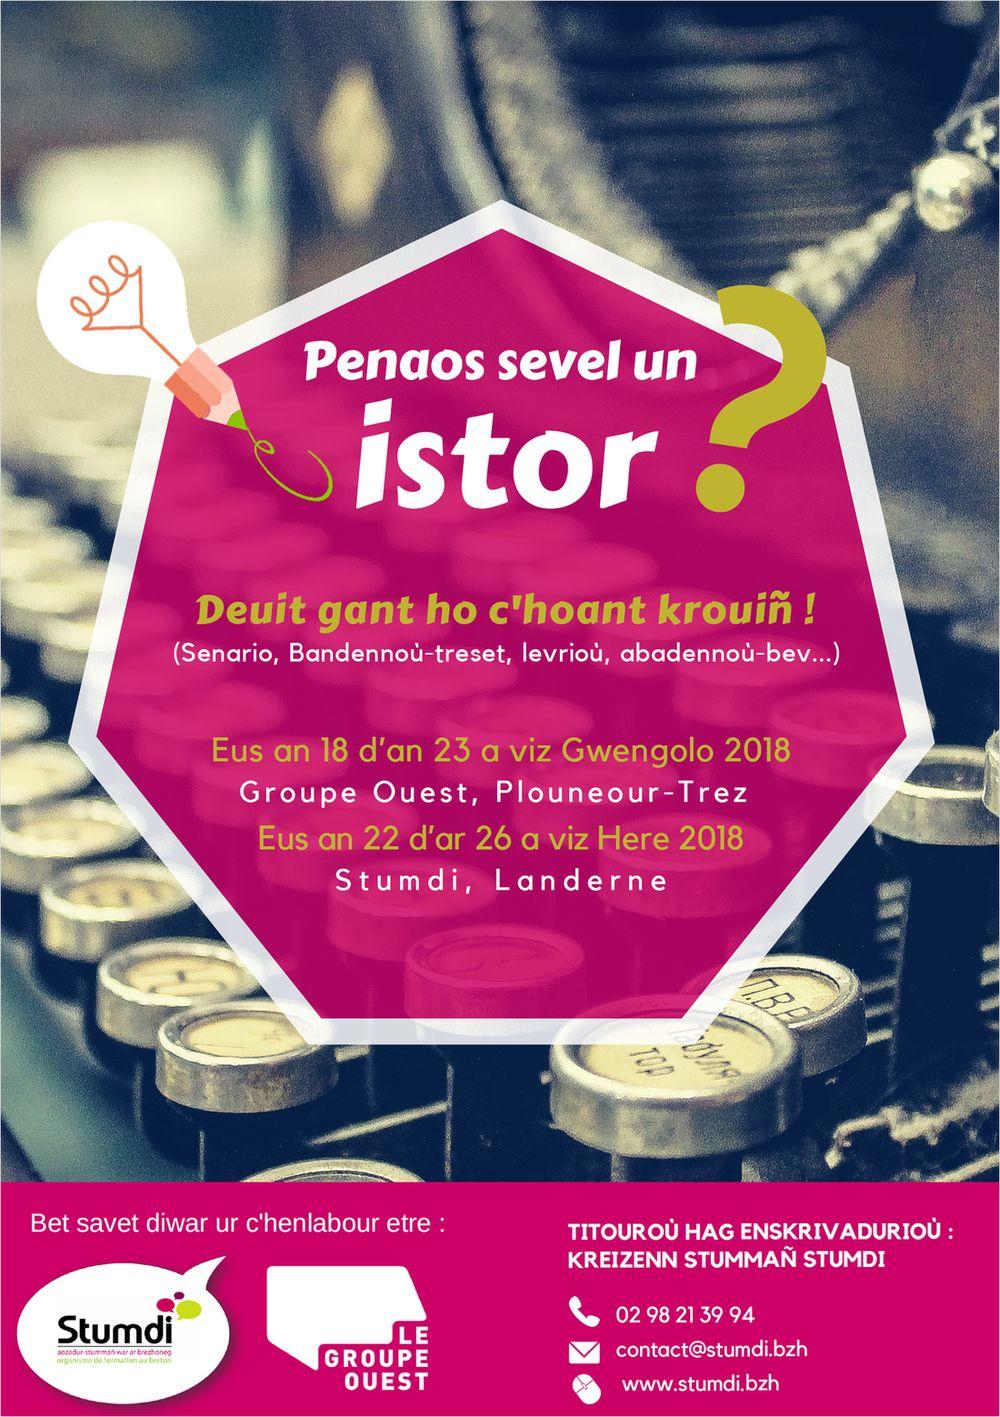 Skritell Penaos sevel un istor - Stumdi organisme de formation en langue bretonne